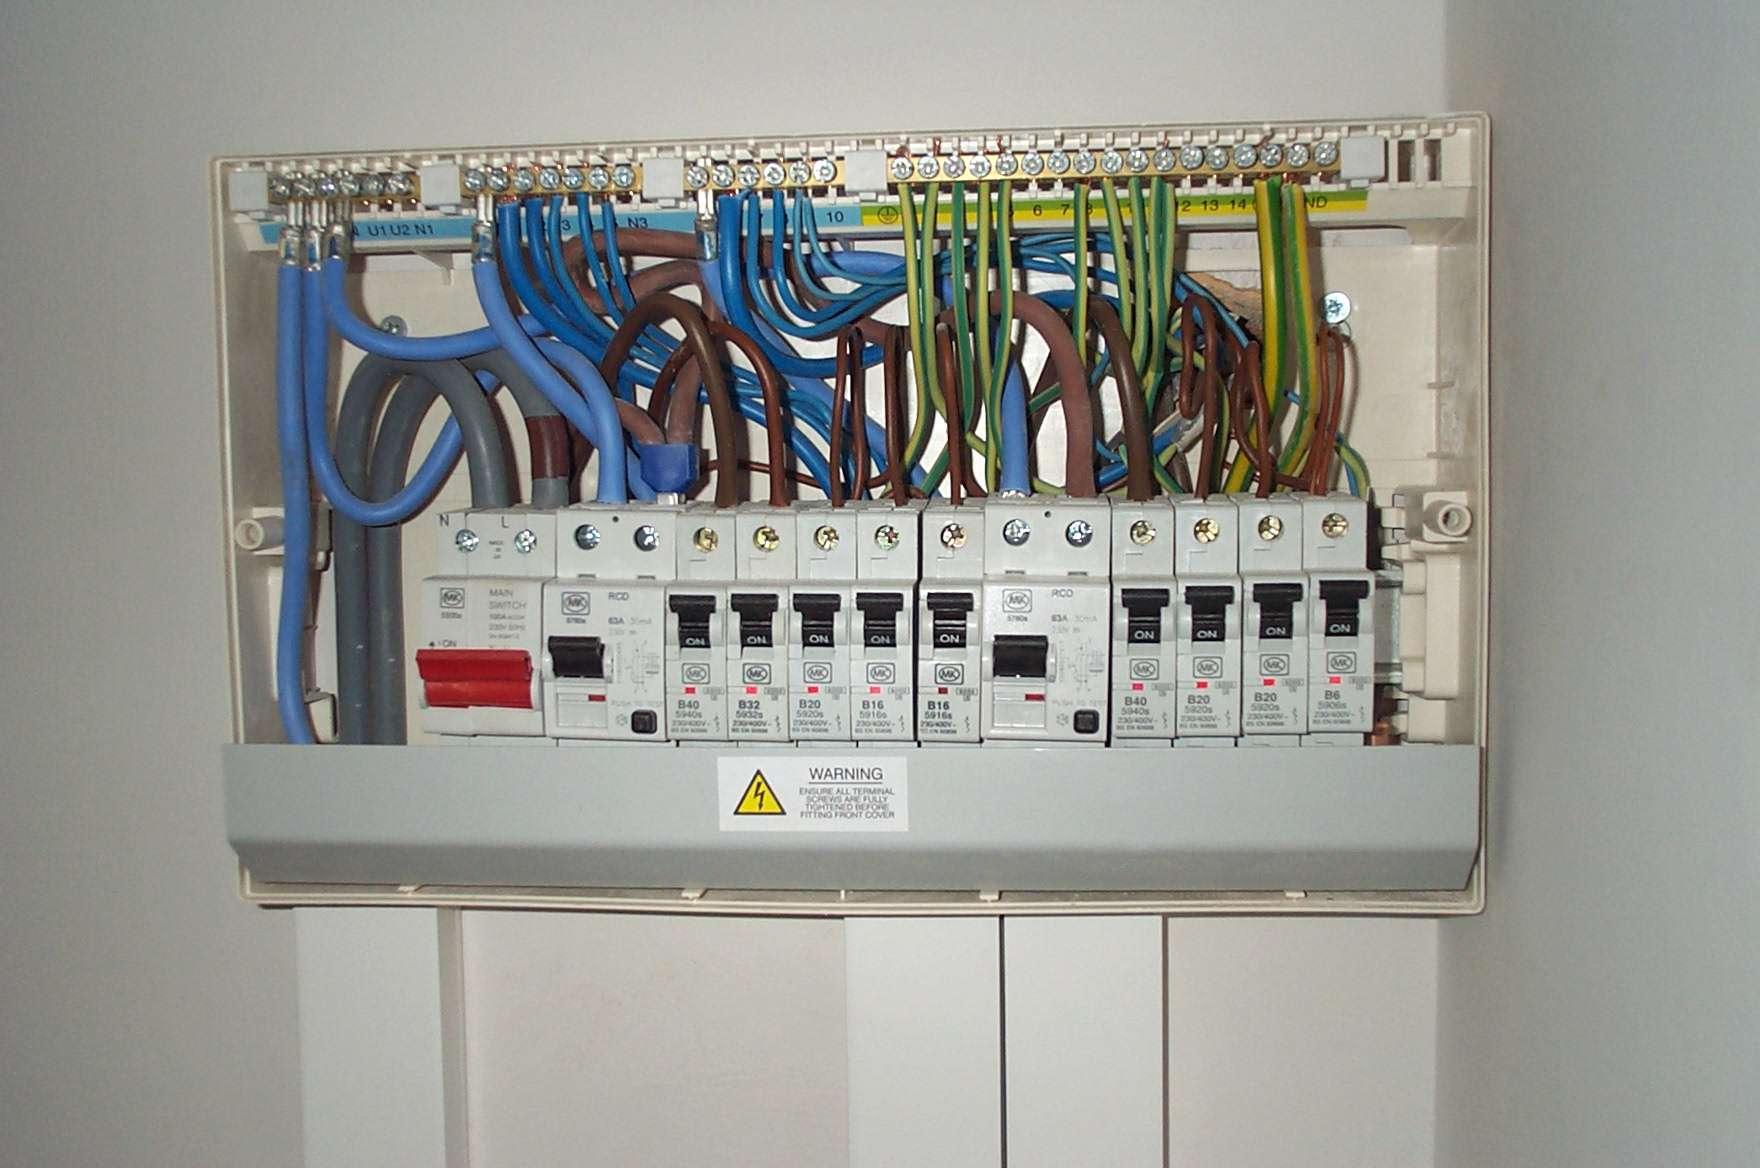 hight resolution of wiring diagram garage consumer unit online wiring diagramconsumer unit wiring diagram garage 16